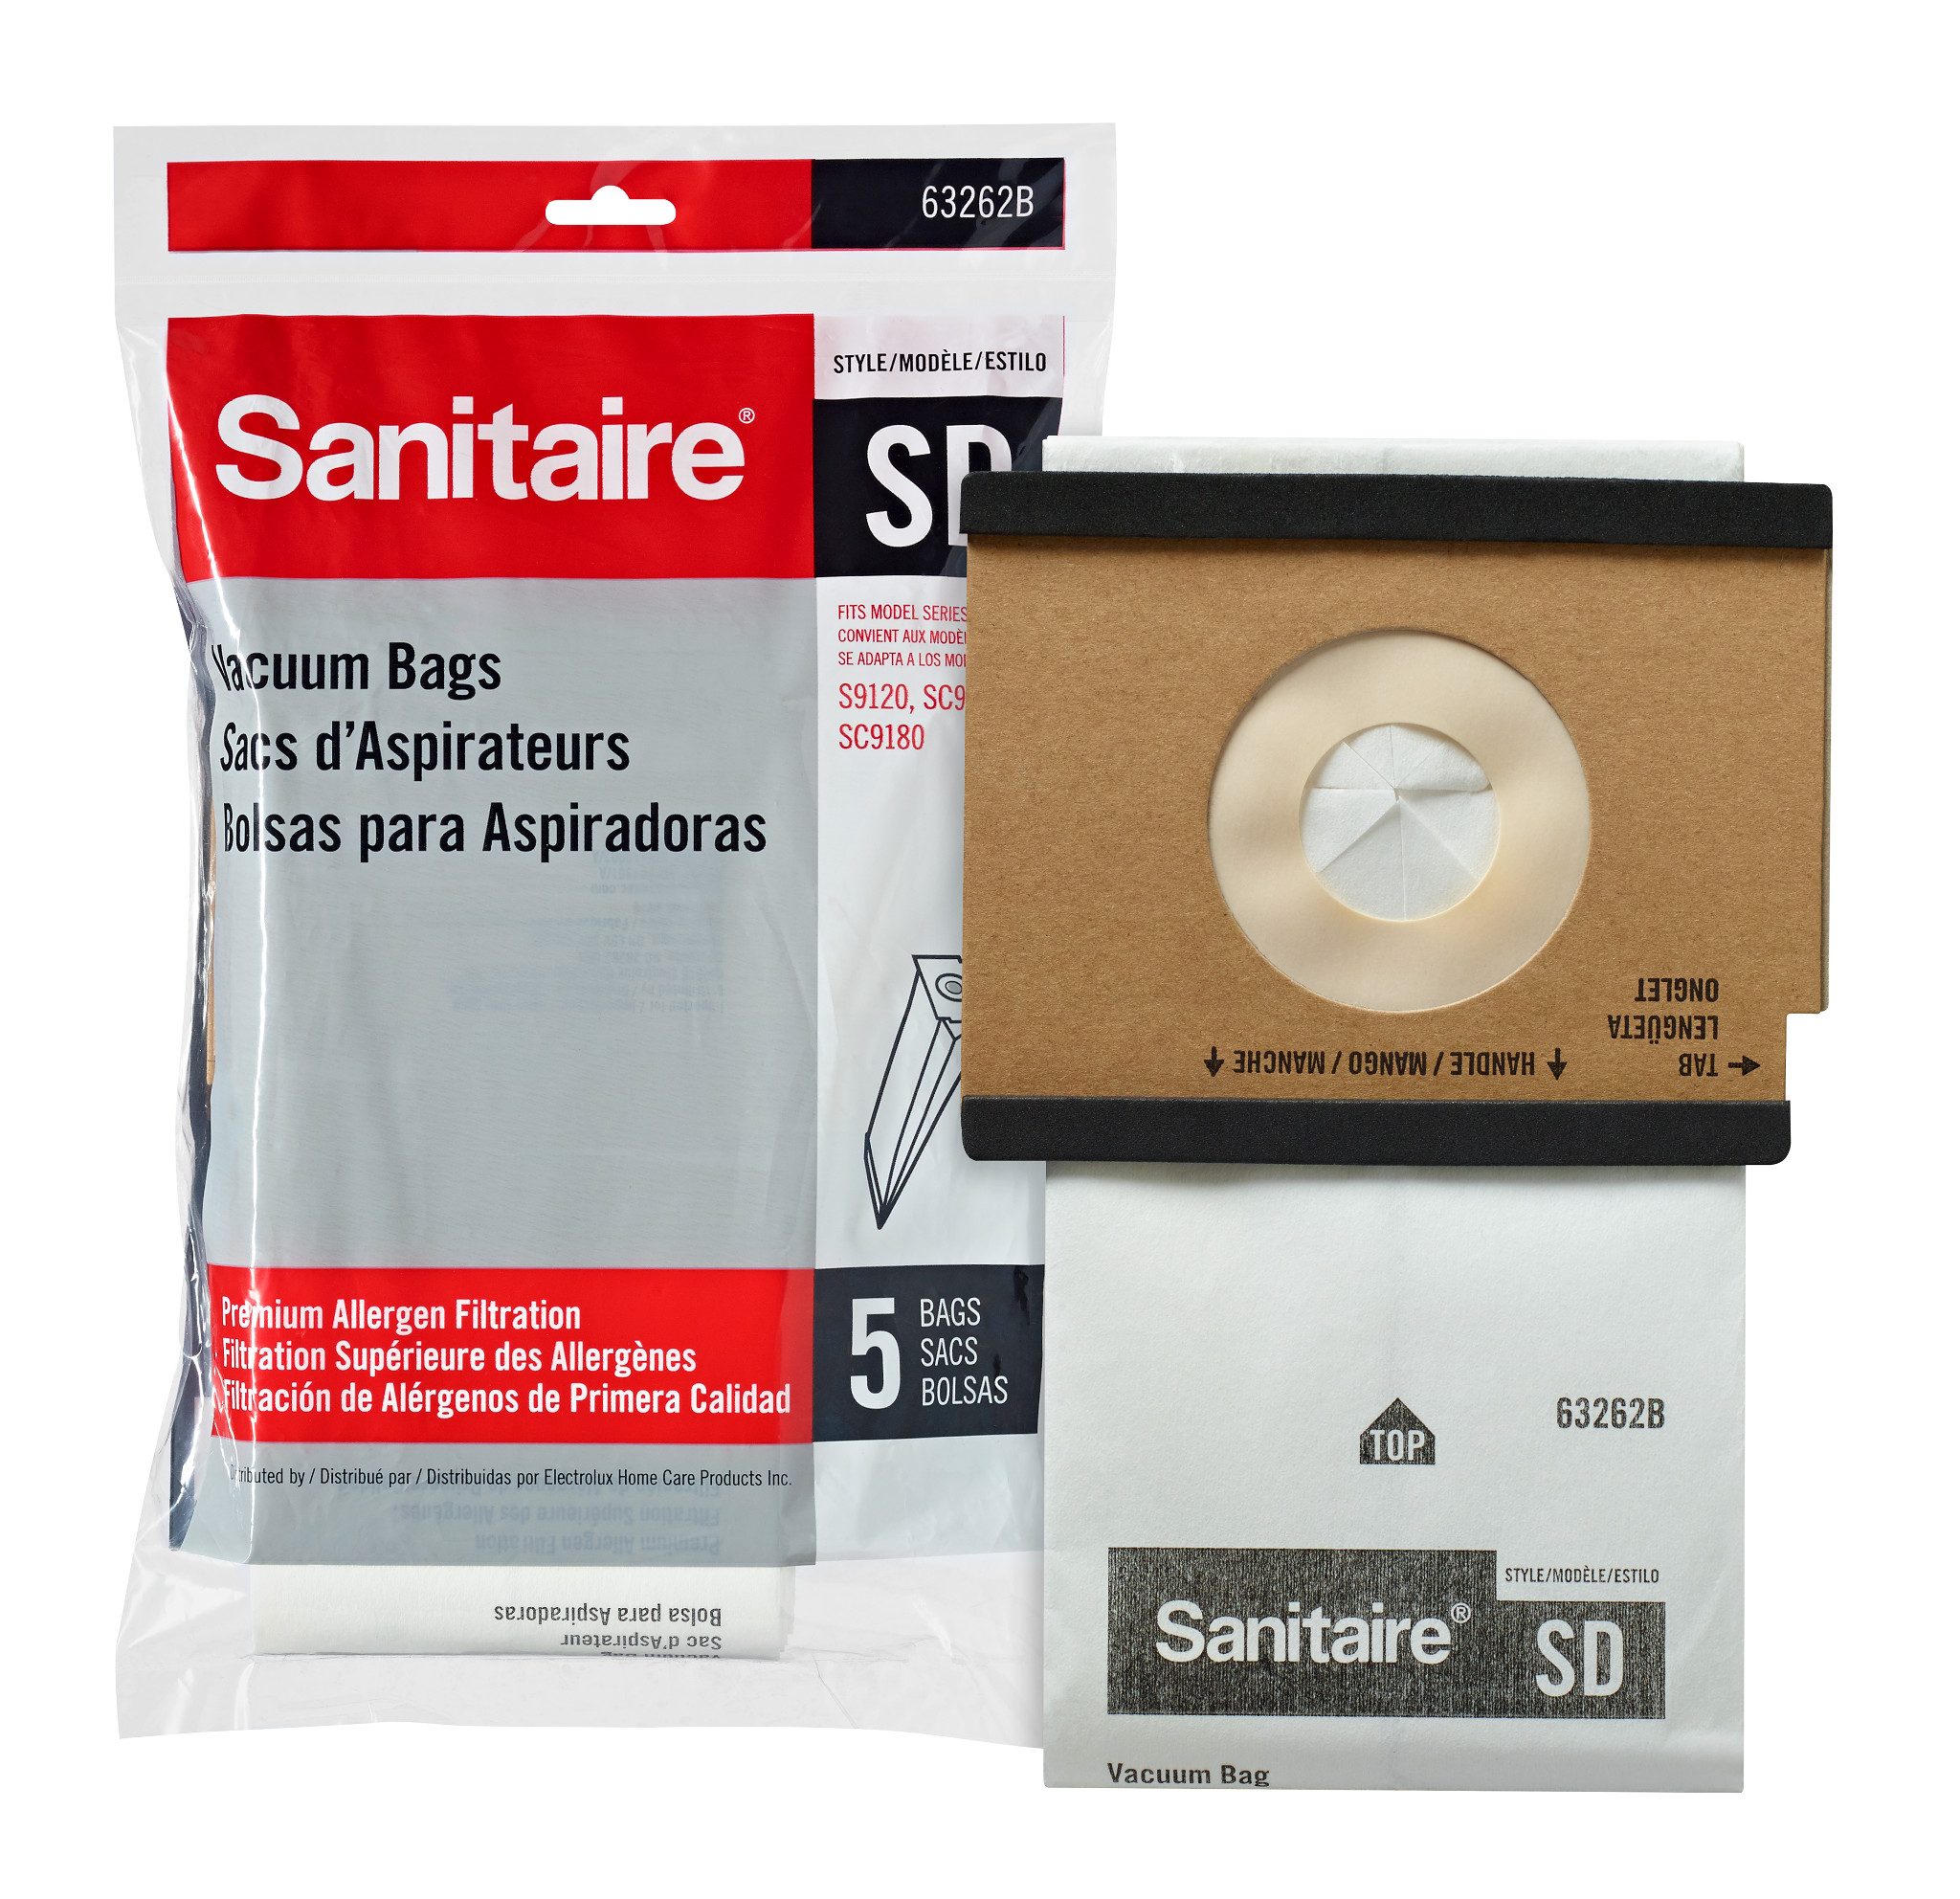 63262b 10 Sd Box Of 50 Dust Bags